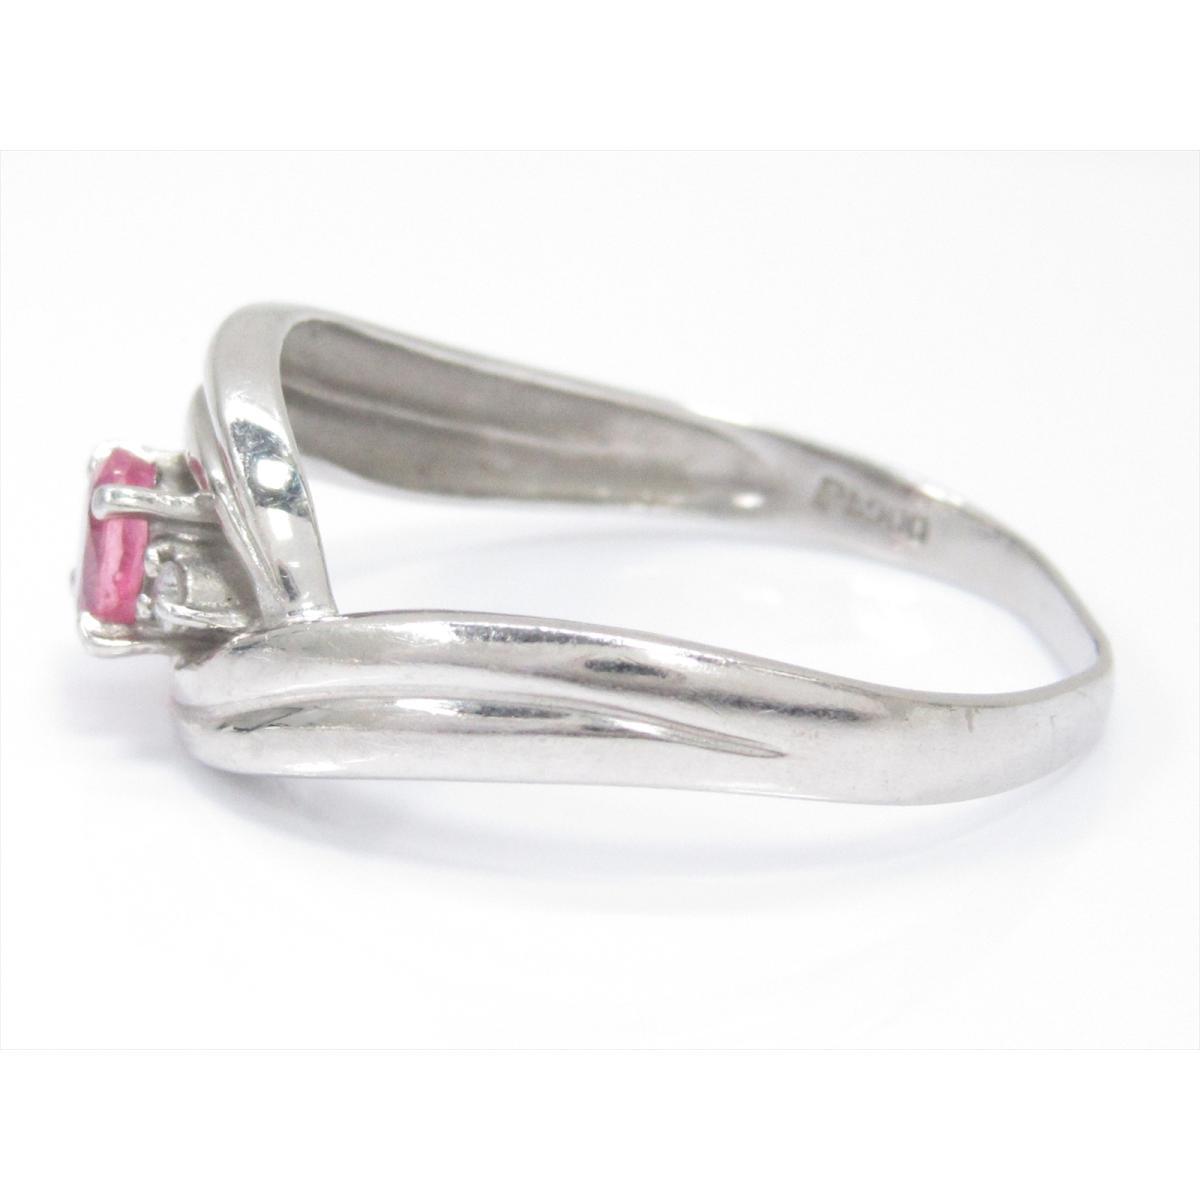 b71c677fdd4e ジュエリー ピンクサファイアリング 指輪 ノーブランドジュエリー レディース PT900 (0.30ct) xダイヤモンド (0.03ct) 【中古】  | JEWELRY BRANDOFF ブランドオフ ...